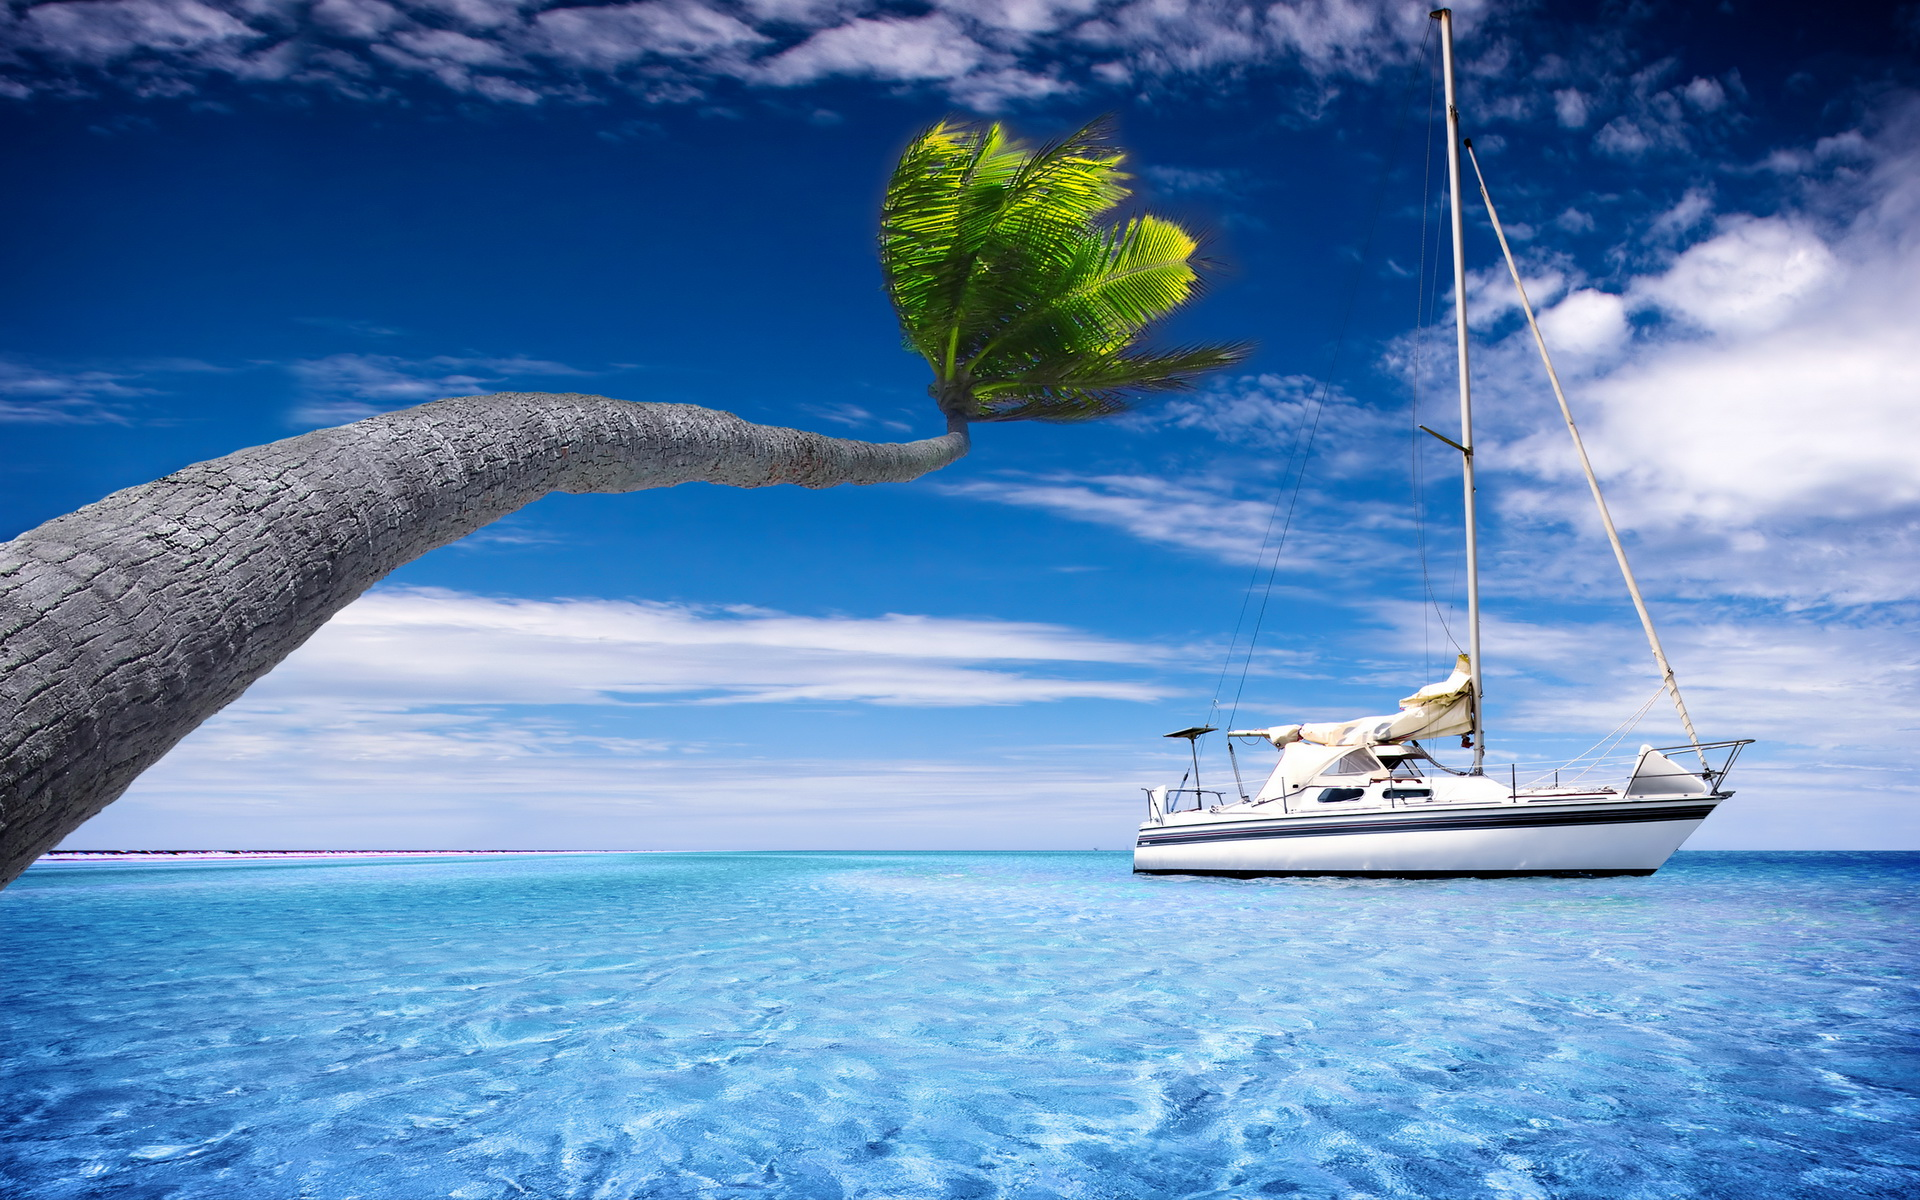 Sailboat Holiday Summer 4k Hd Desktop Wallpaper For 4k: Sailboat HD Wallpaper